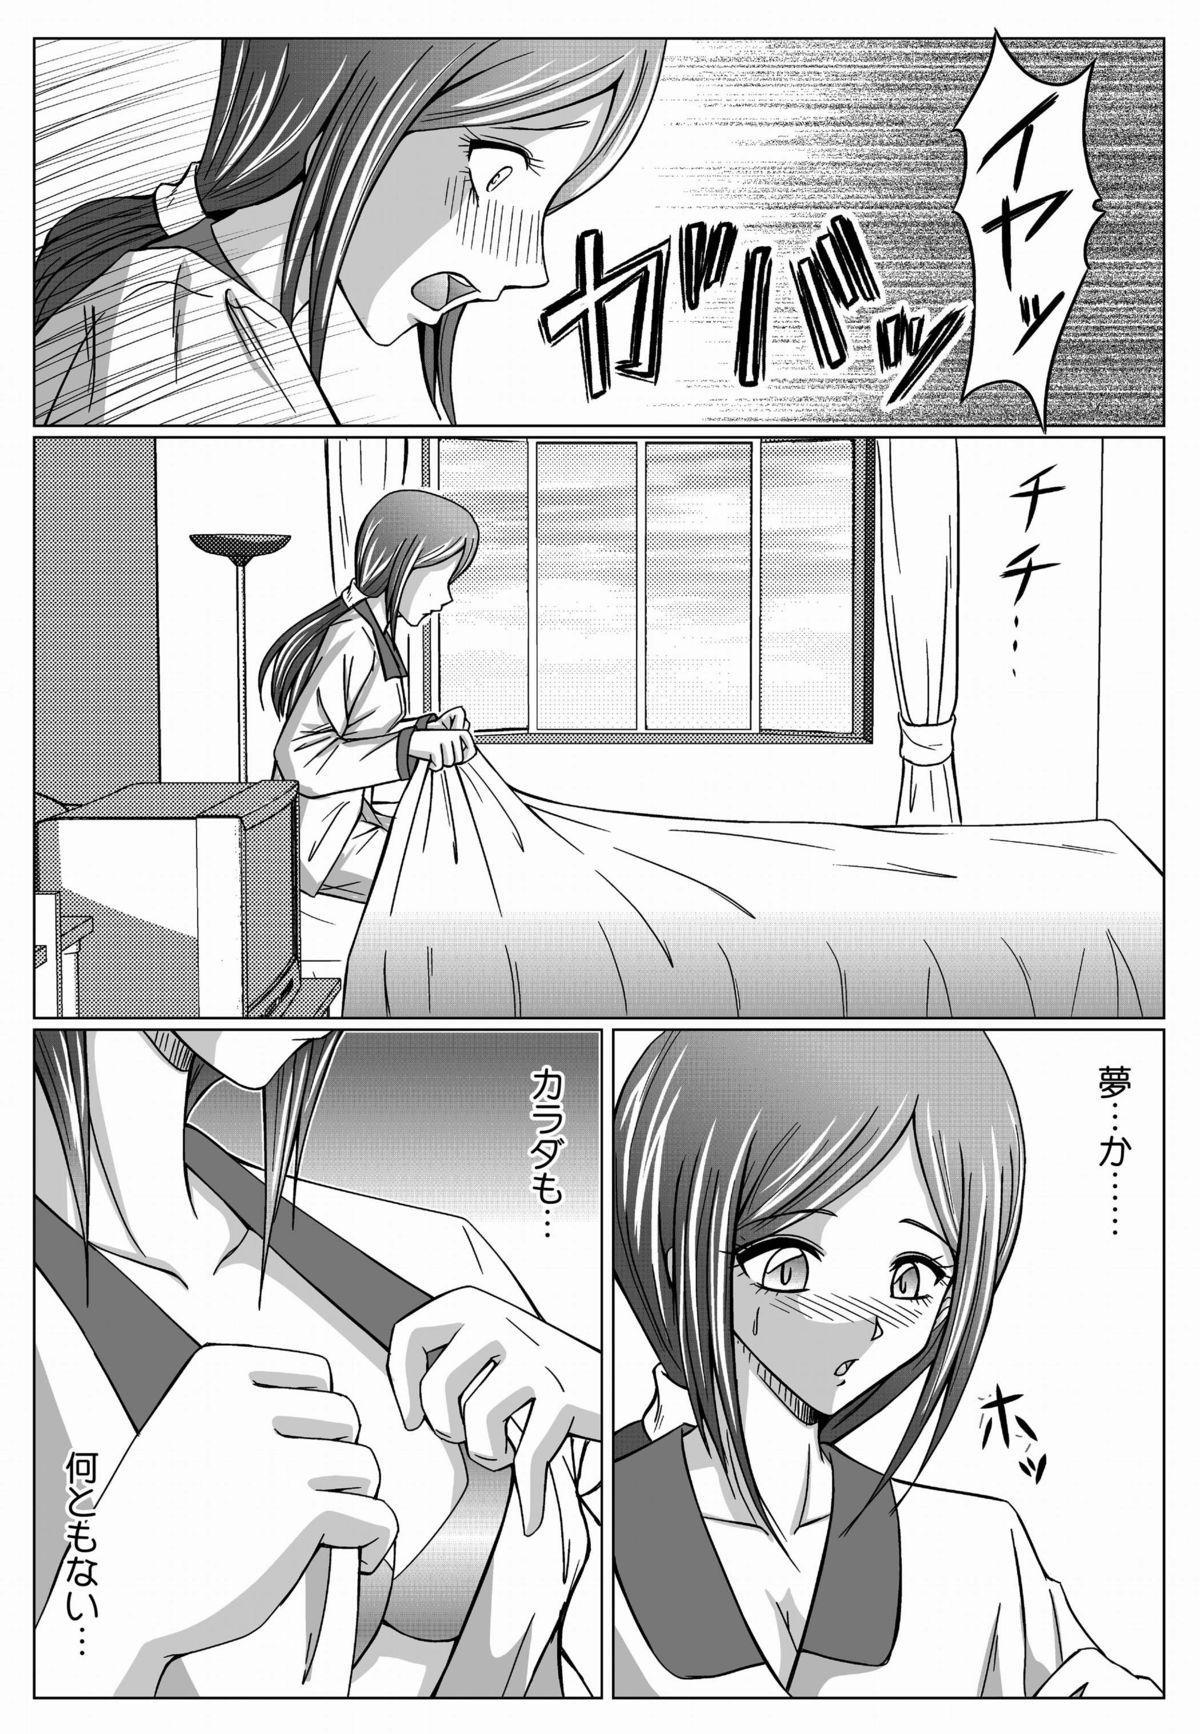 [Macxe's (monmon)] Tokubousentai Dinaranger ~Heroine Kairaku Sennou Keikaku~ Vol.01/02/03 (Renkaban) [Digital] 103